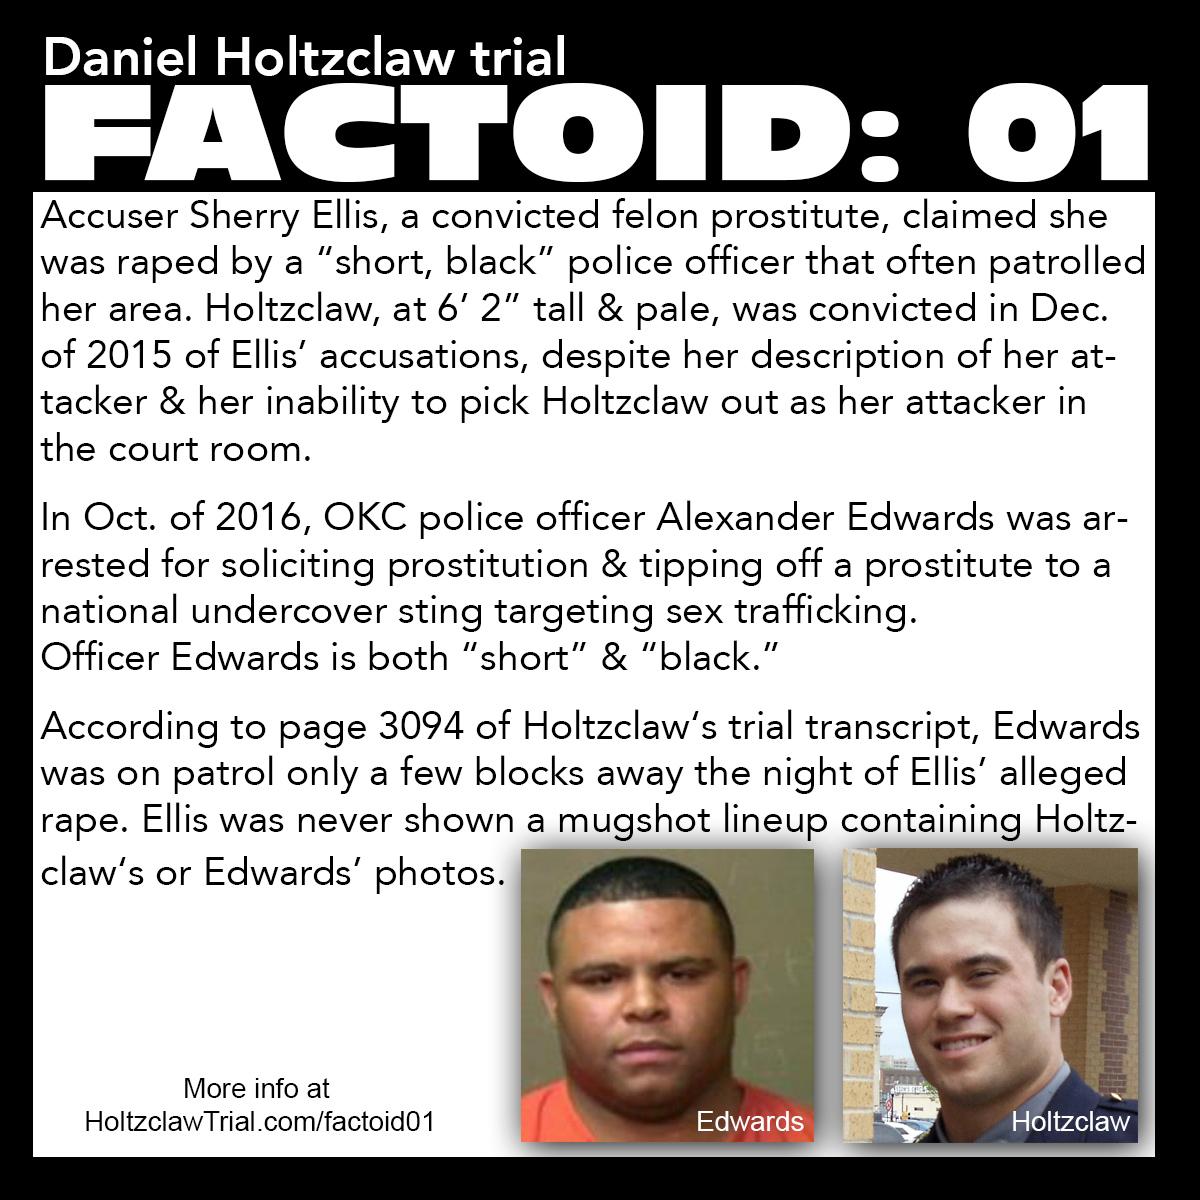 Holtzclaw Factoid Template.jpg